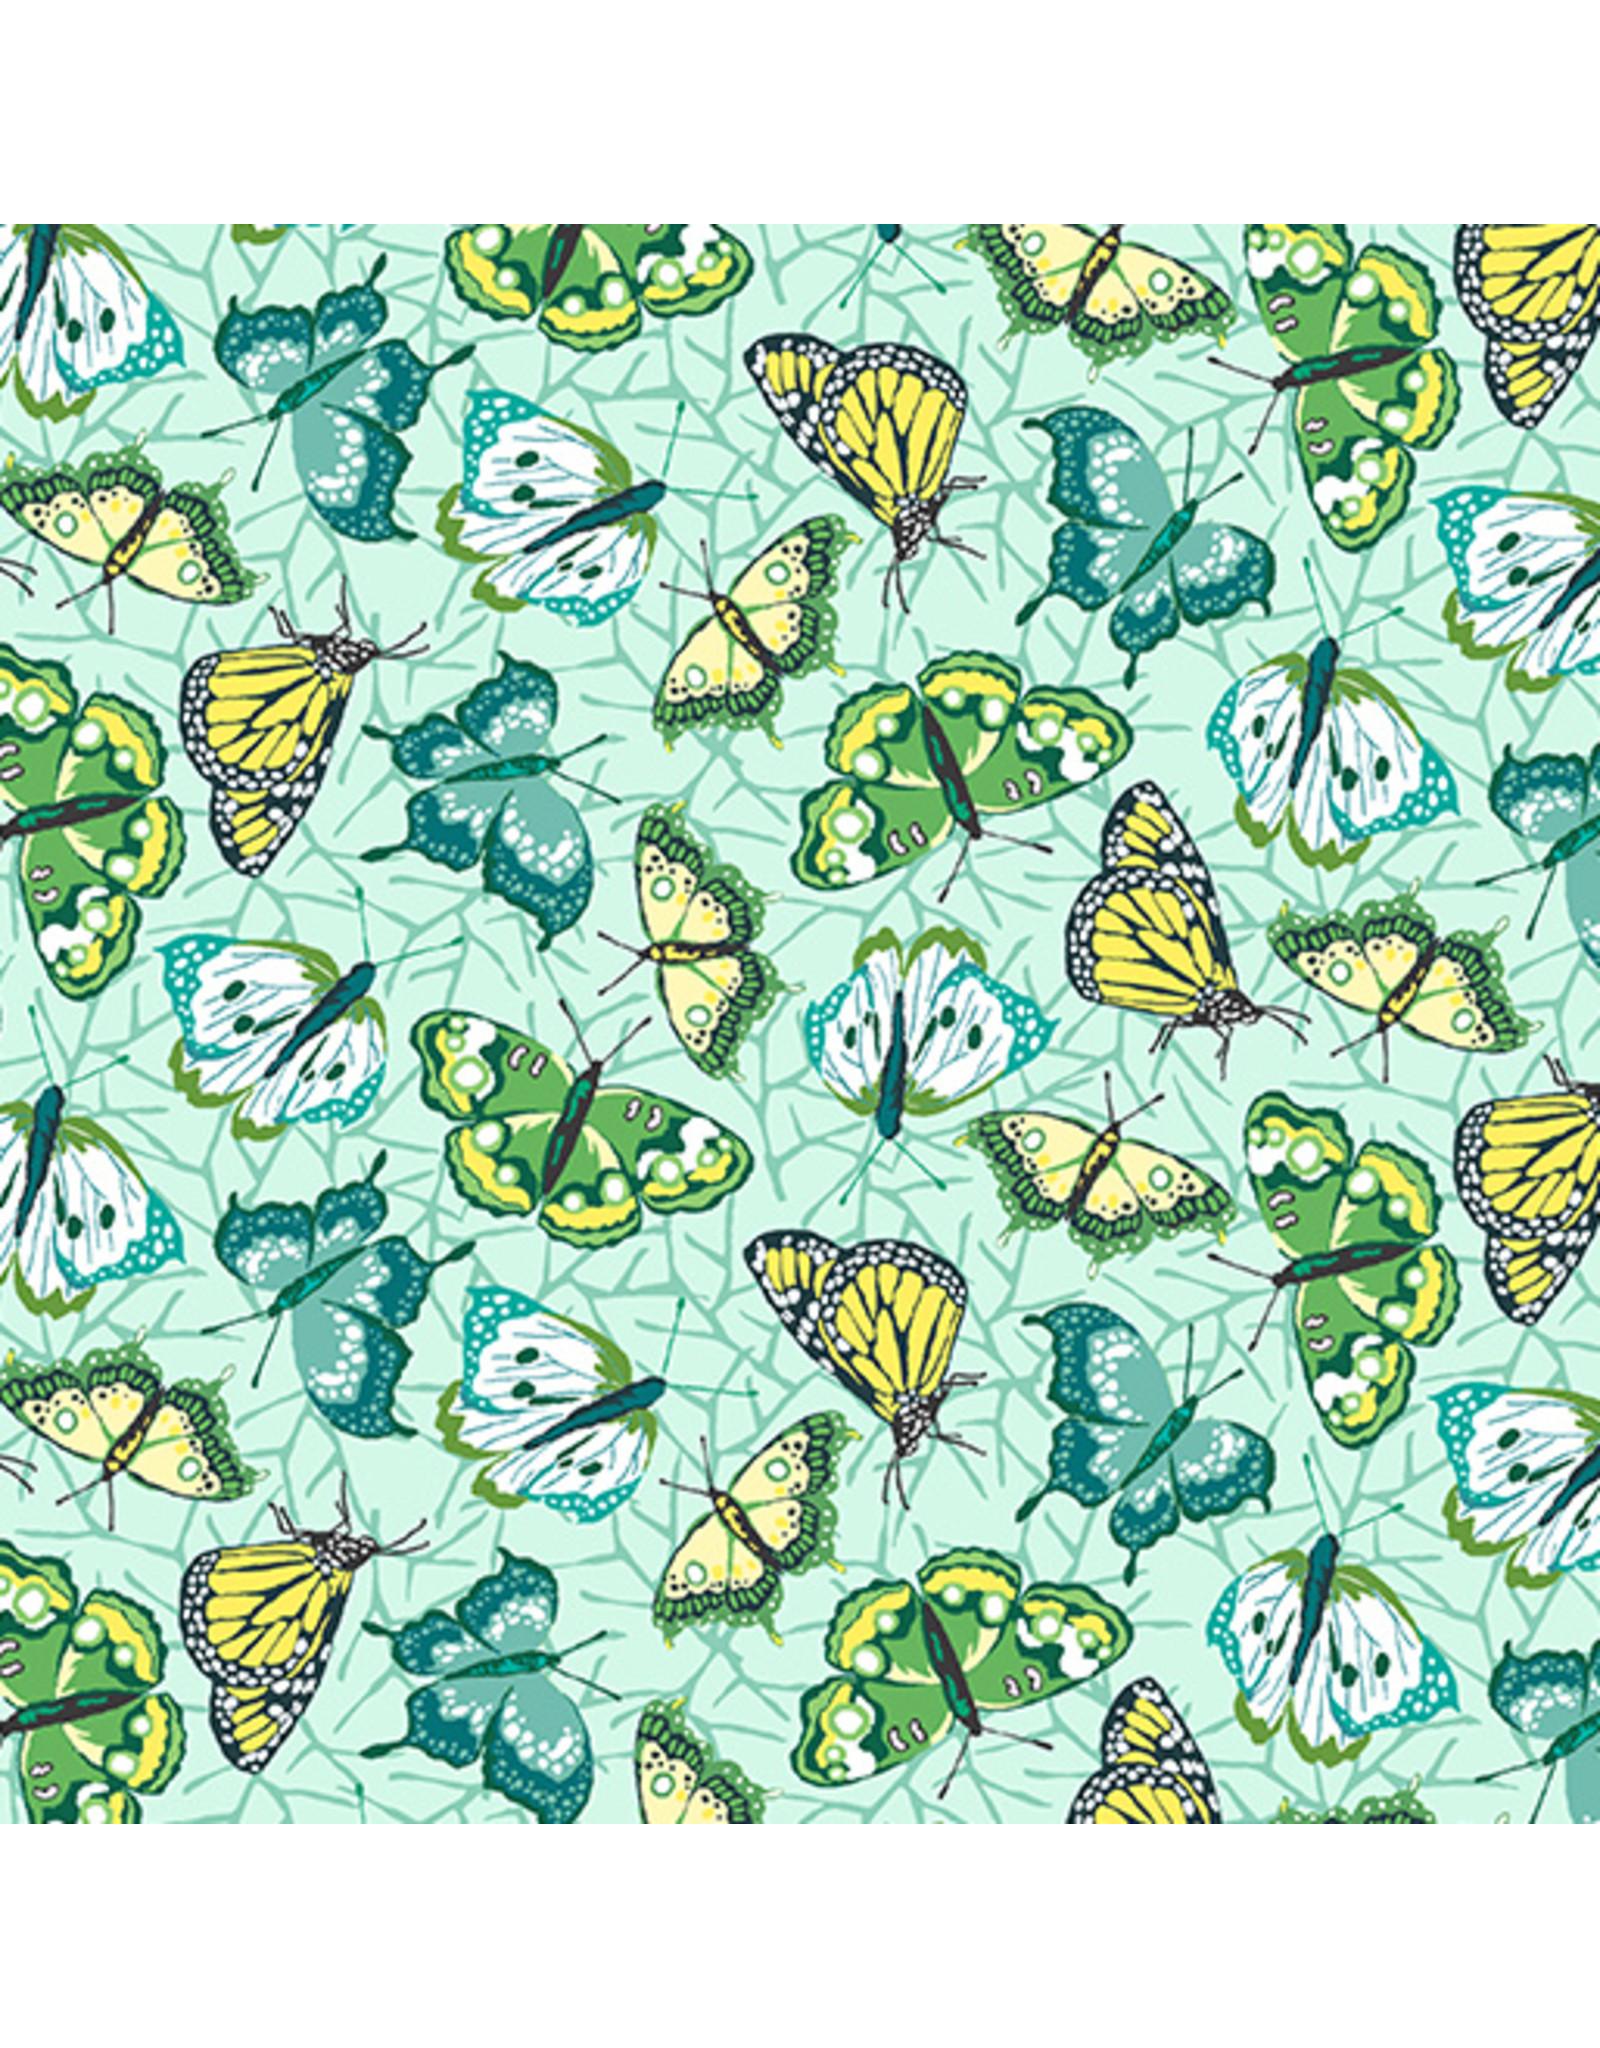 Contempo Under the Sun - Butterflies Mint